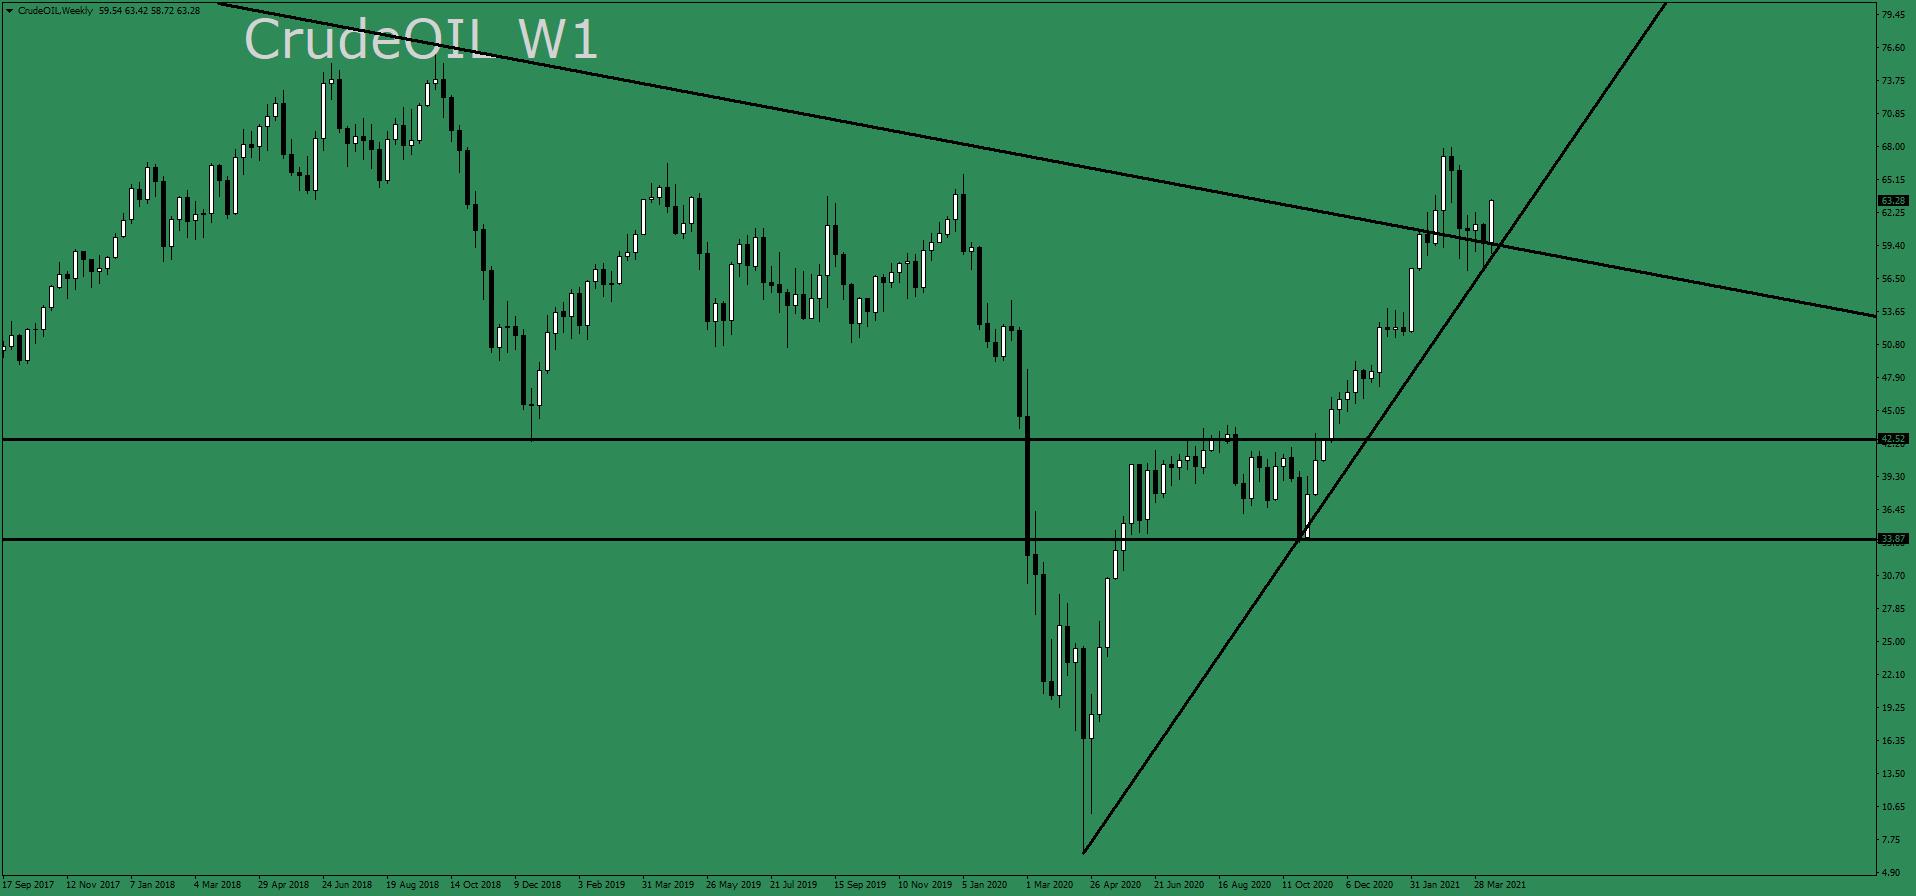 crudeoil-w1-ava-trade-ltd.png